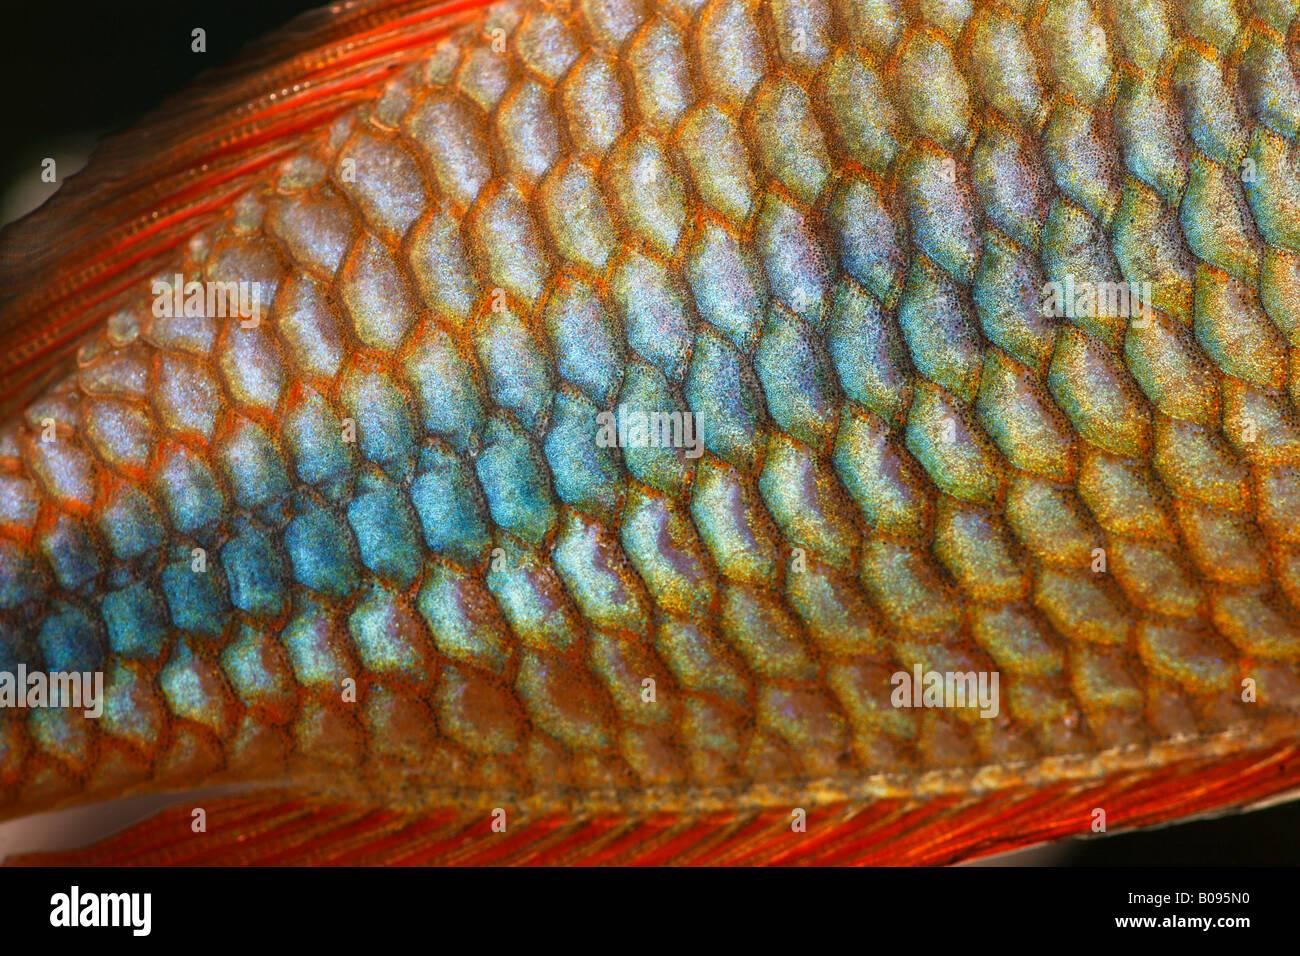 Detail, scales, Goyder River - or Banded Rainbow Fish (Melanotaenia trifasciata) native to Australia, warm water, - Stock Image